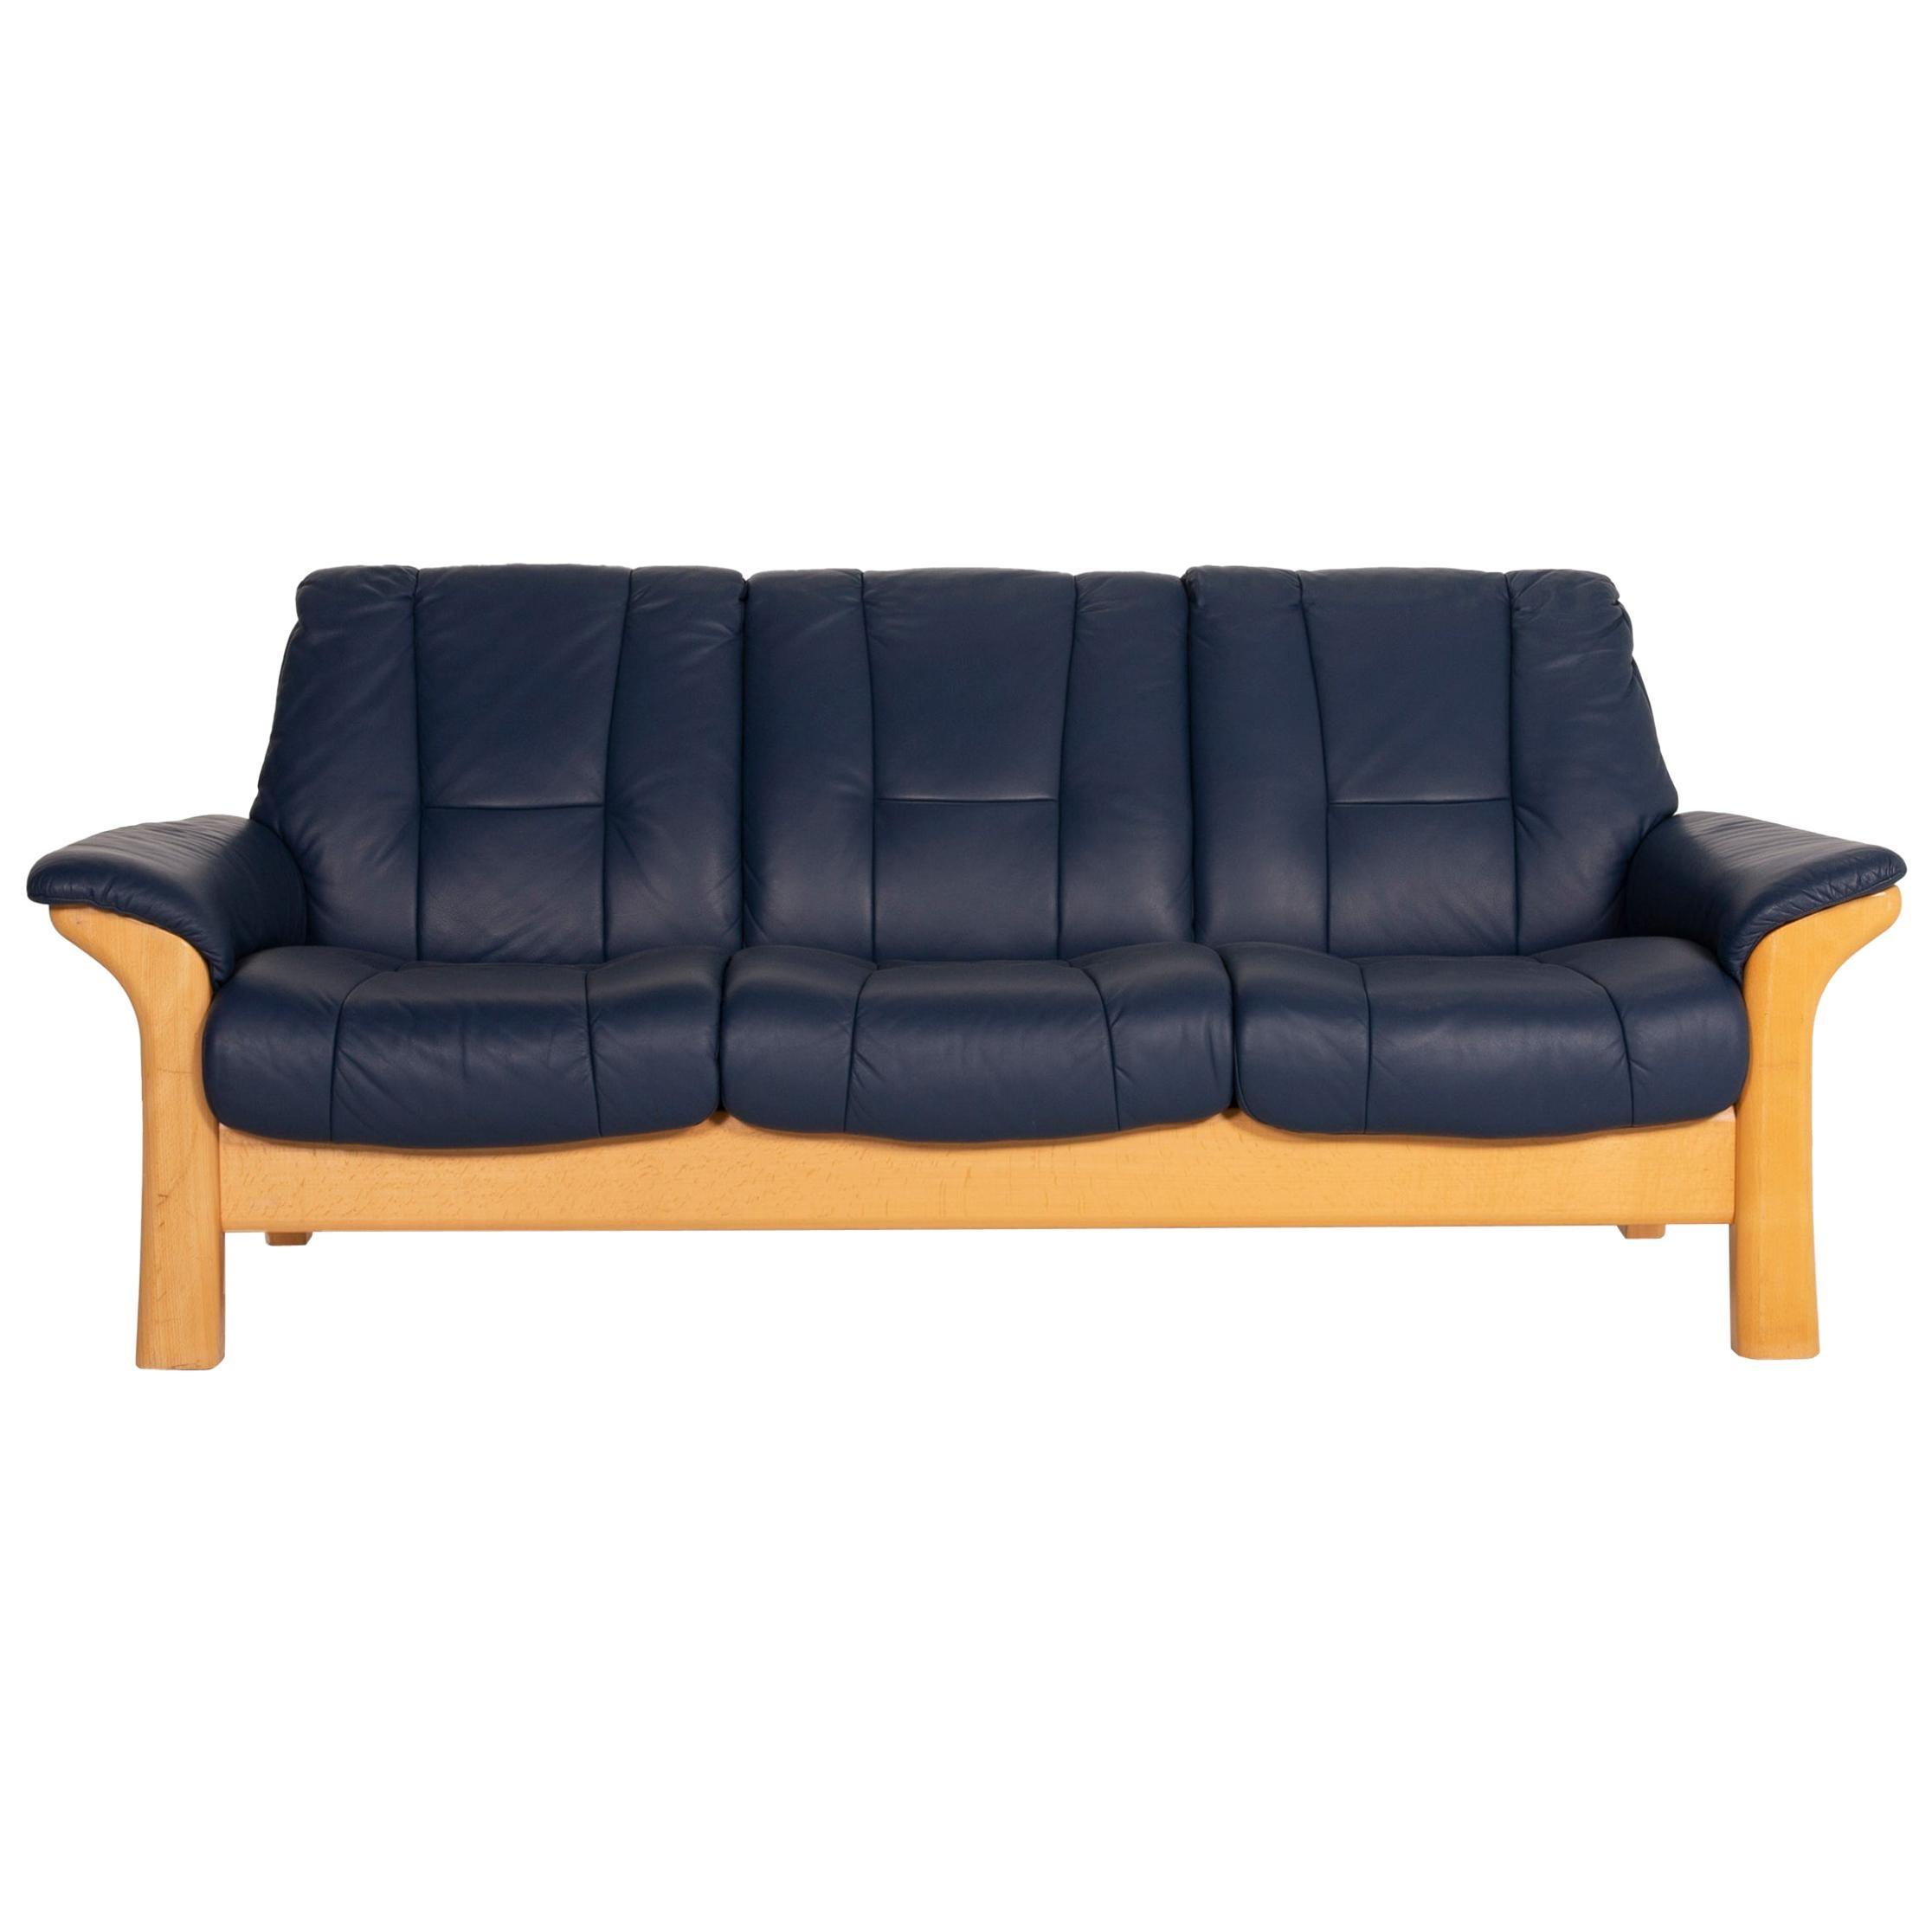 Stressless Buckingham Leather Sofa Blue Three Seater